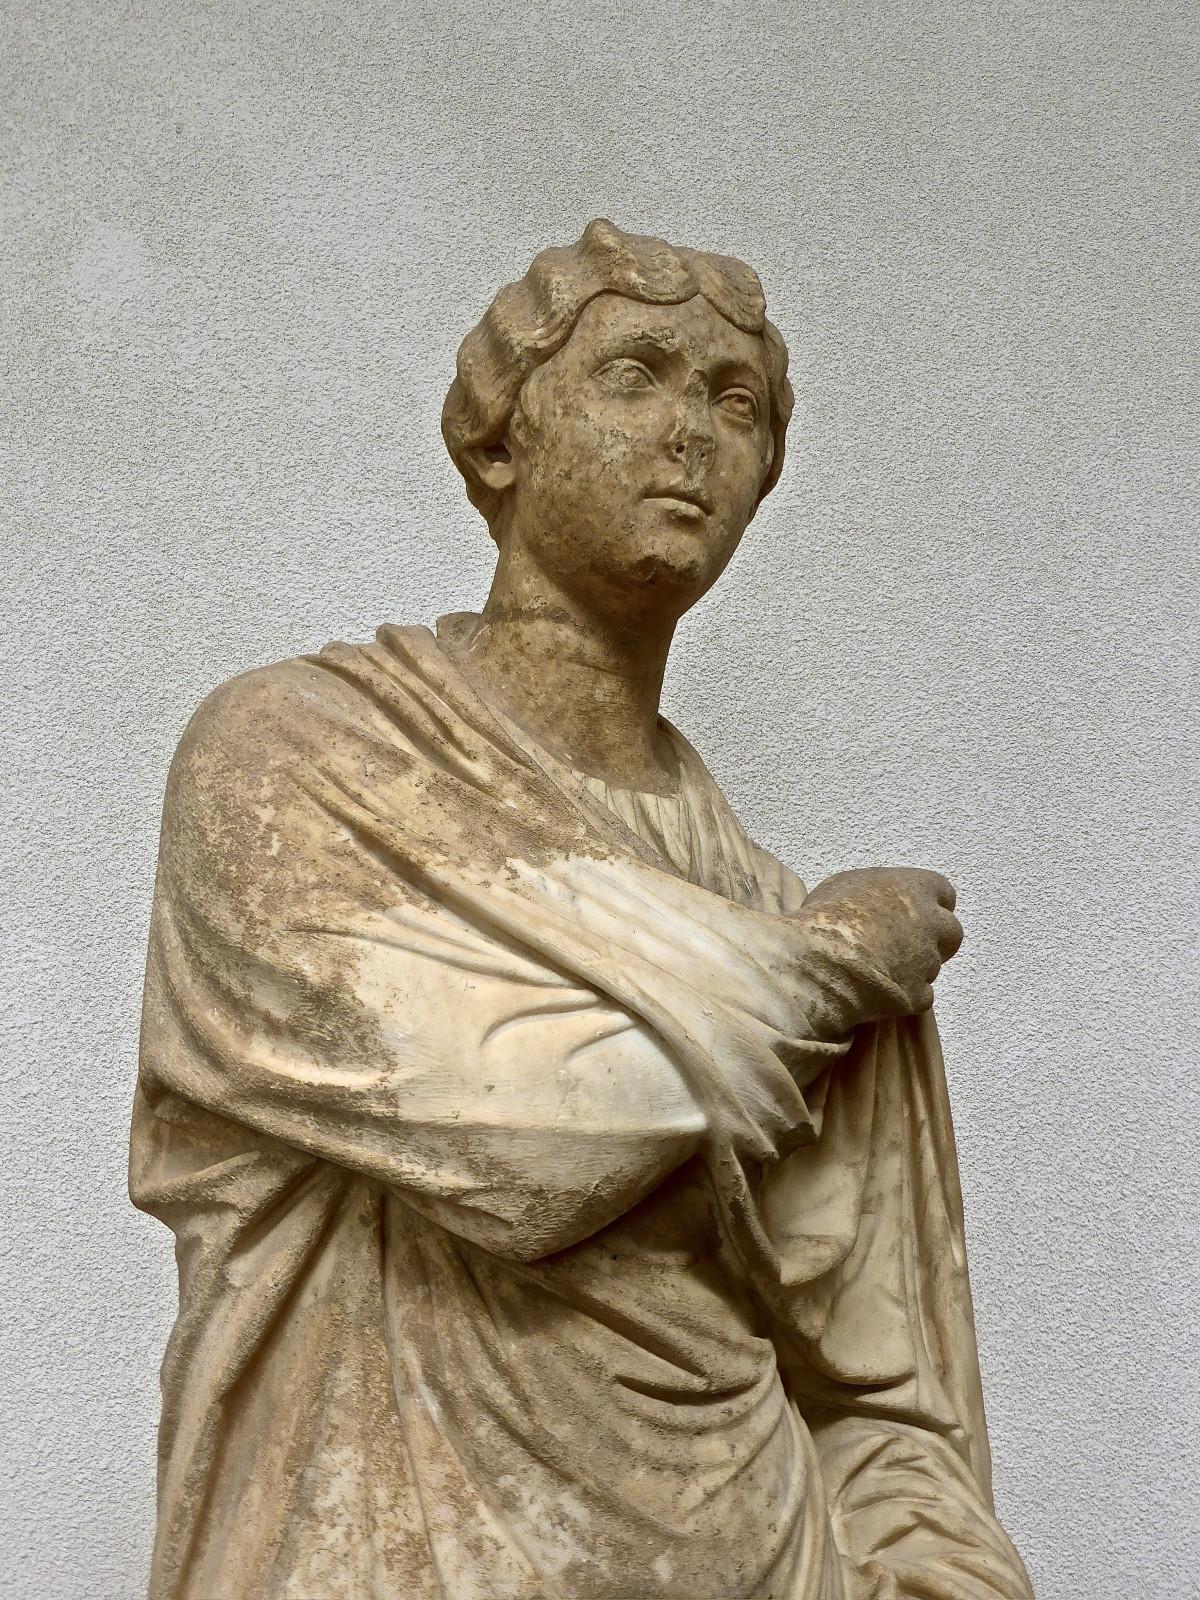 antiguo piedra monumento estatua antiguo histrico